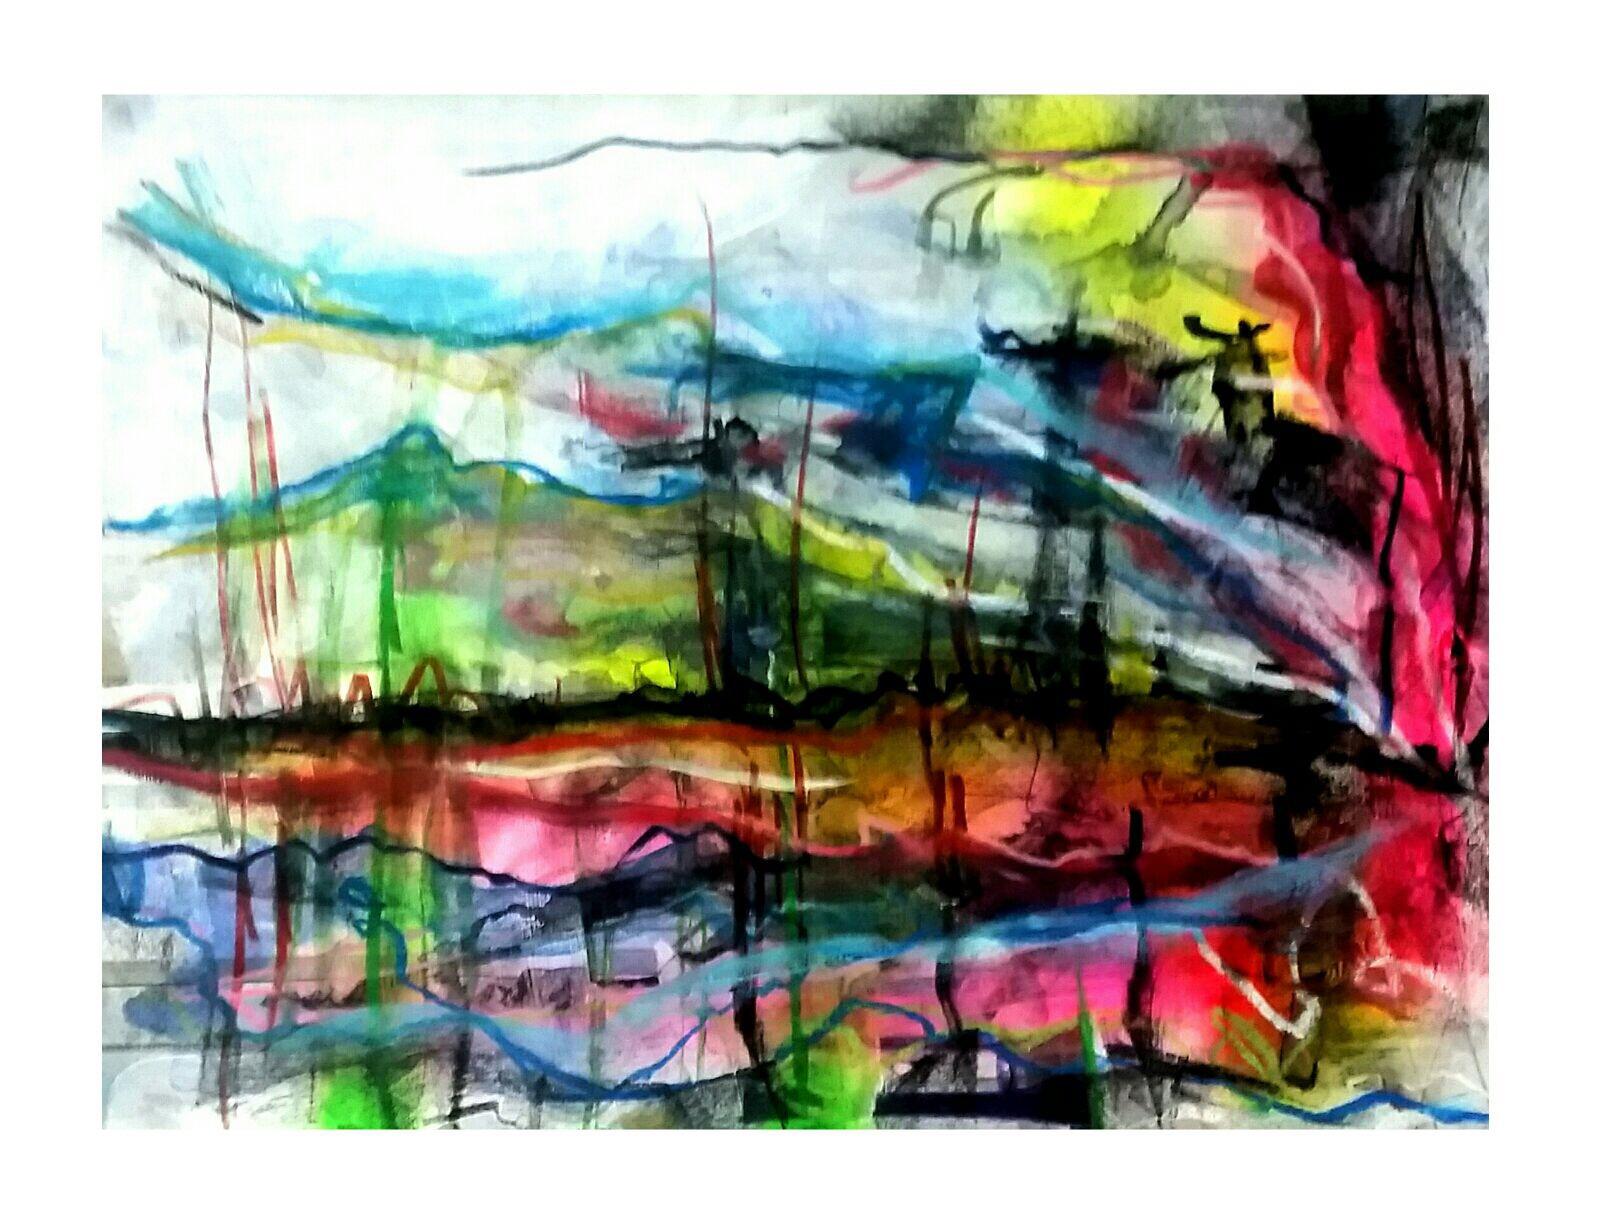 H8051217 Waterkant, afm. 20x28 cm. Materiaal aquarel krijt en acrylverf - Rob Koenders